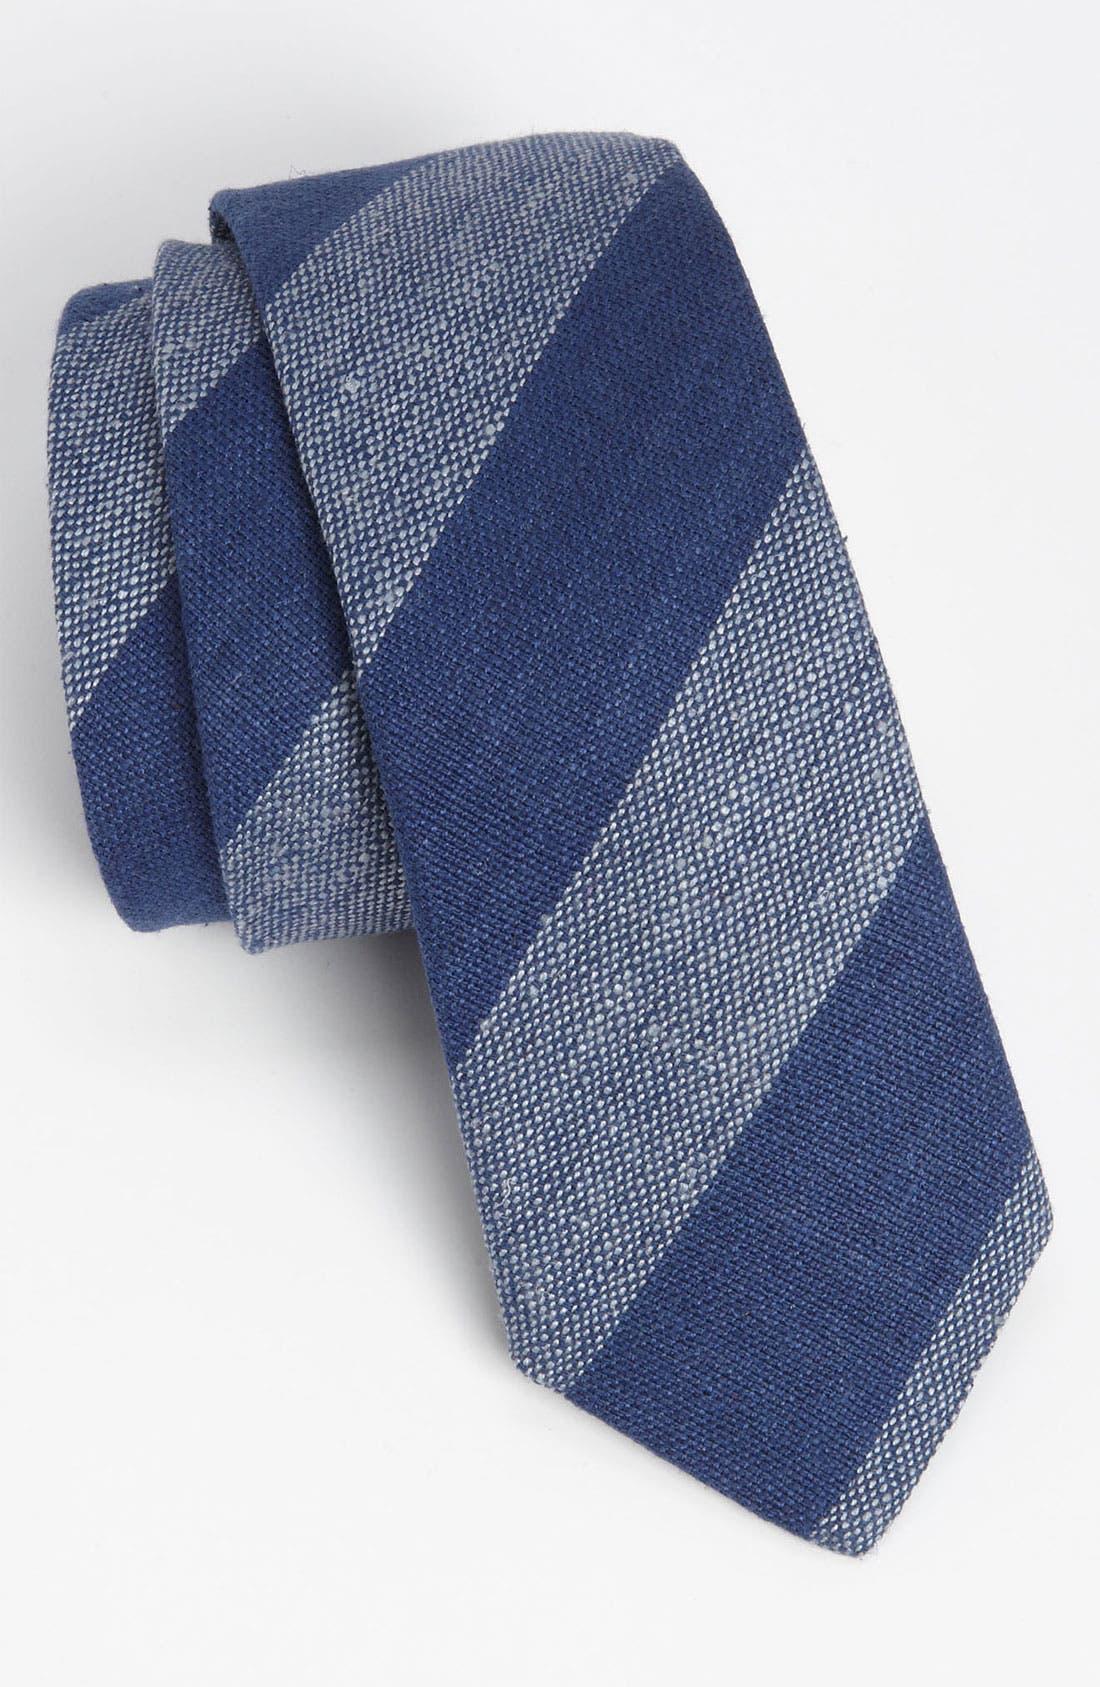 Alternate Image 1 Selected - Gitman Woven Silk Tie